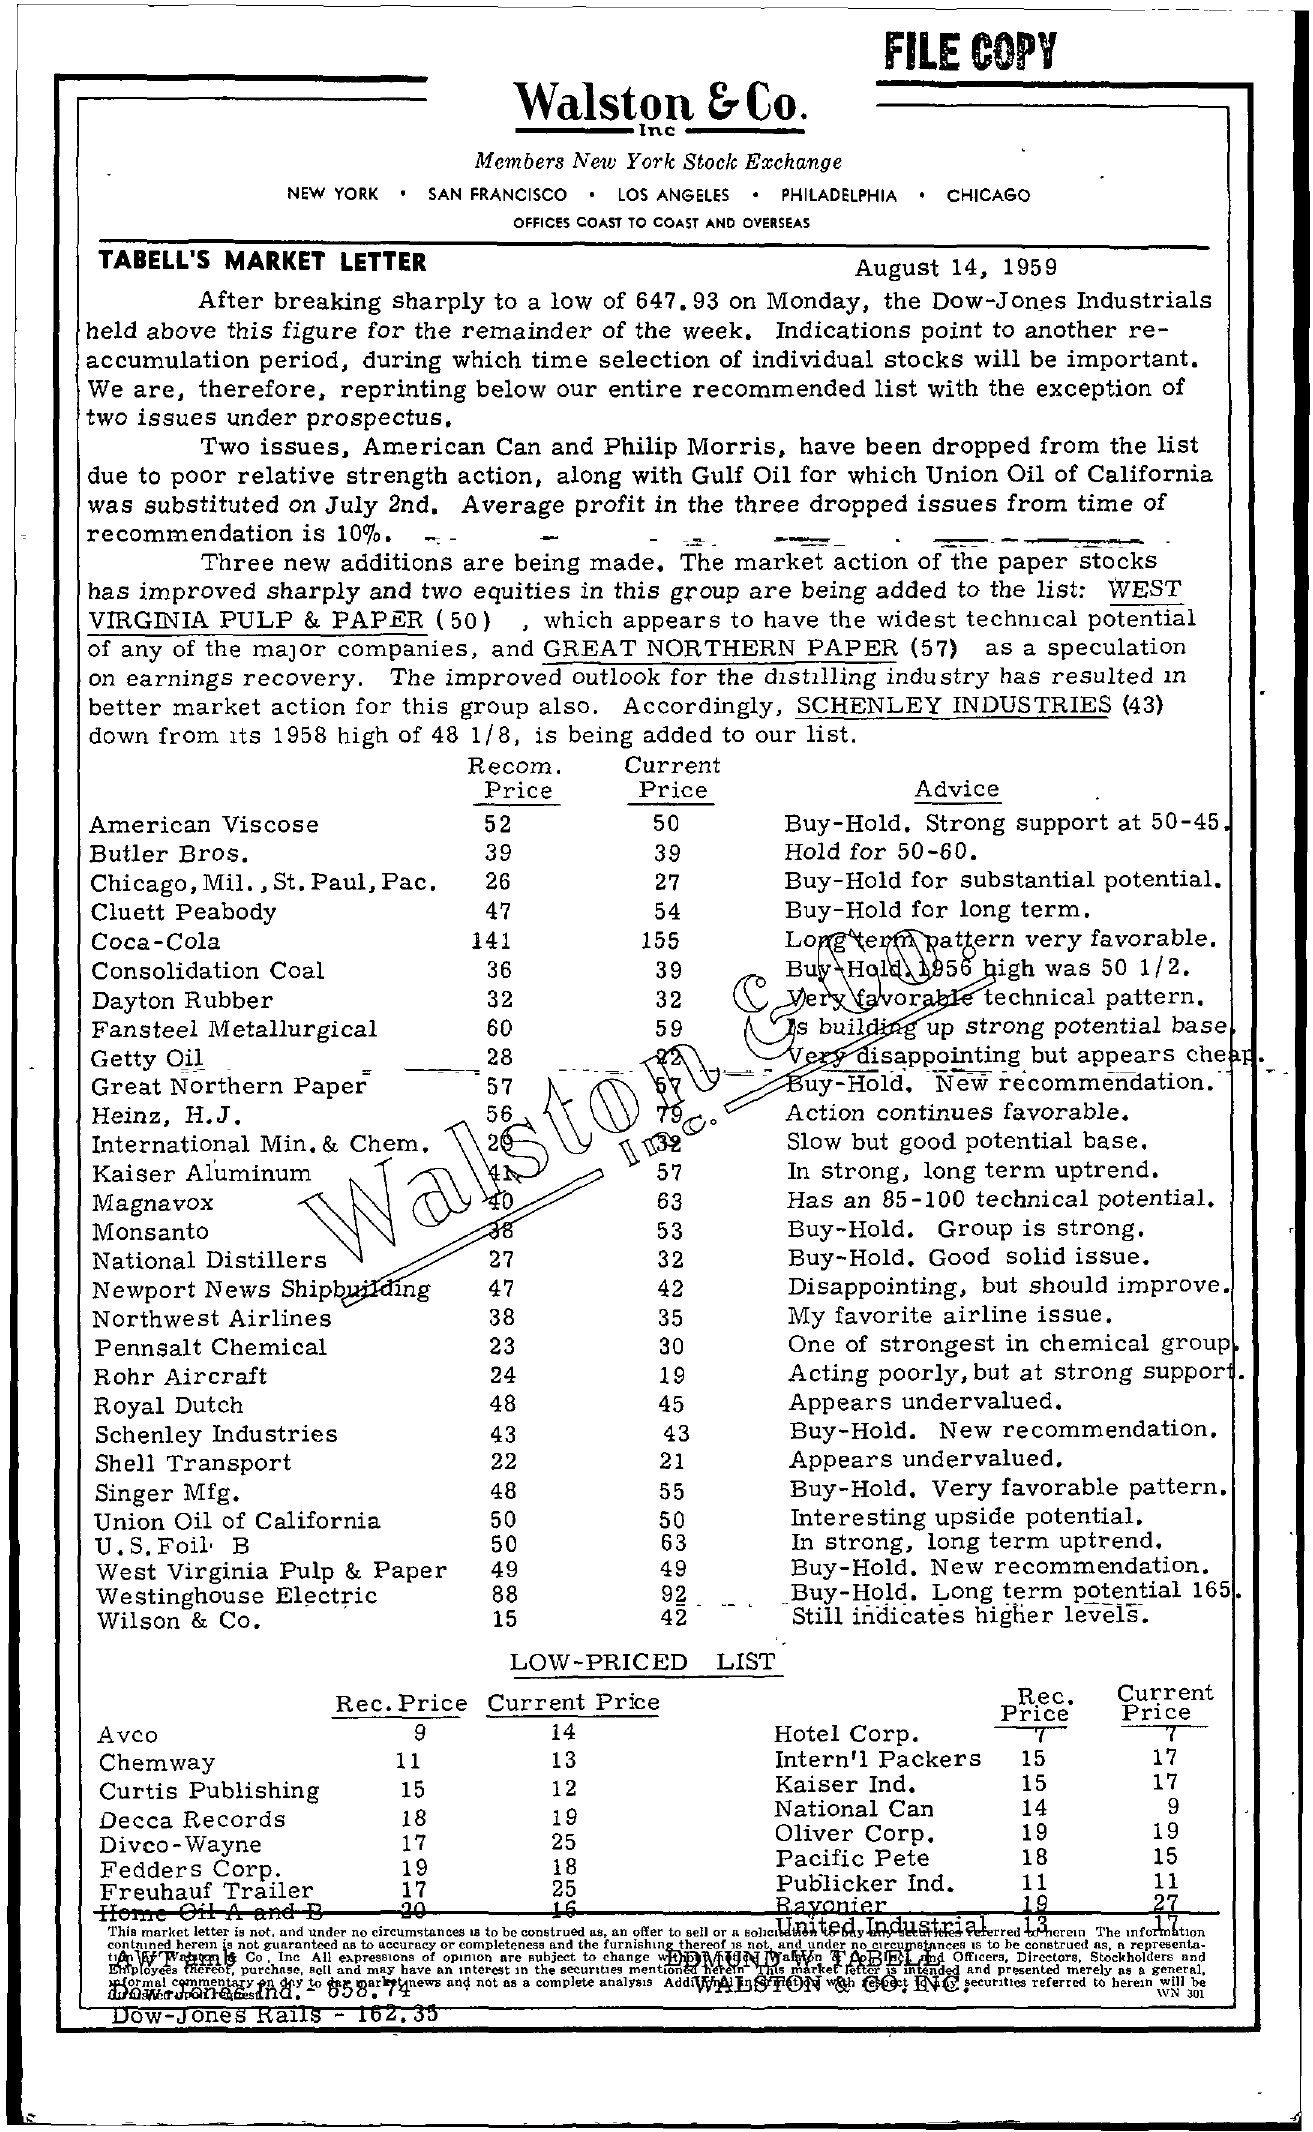 Tabell's Market Letter - August 14, 1959